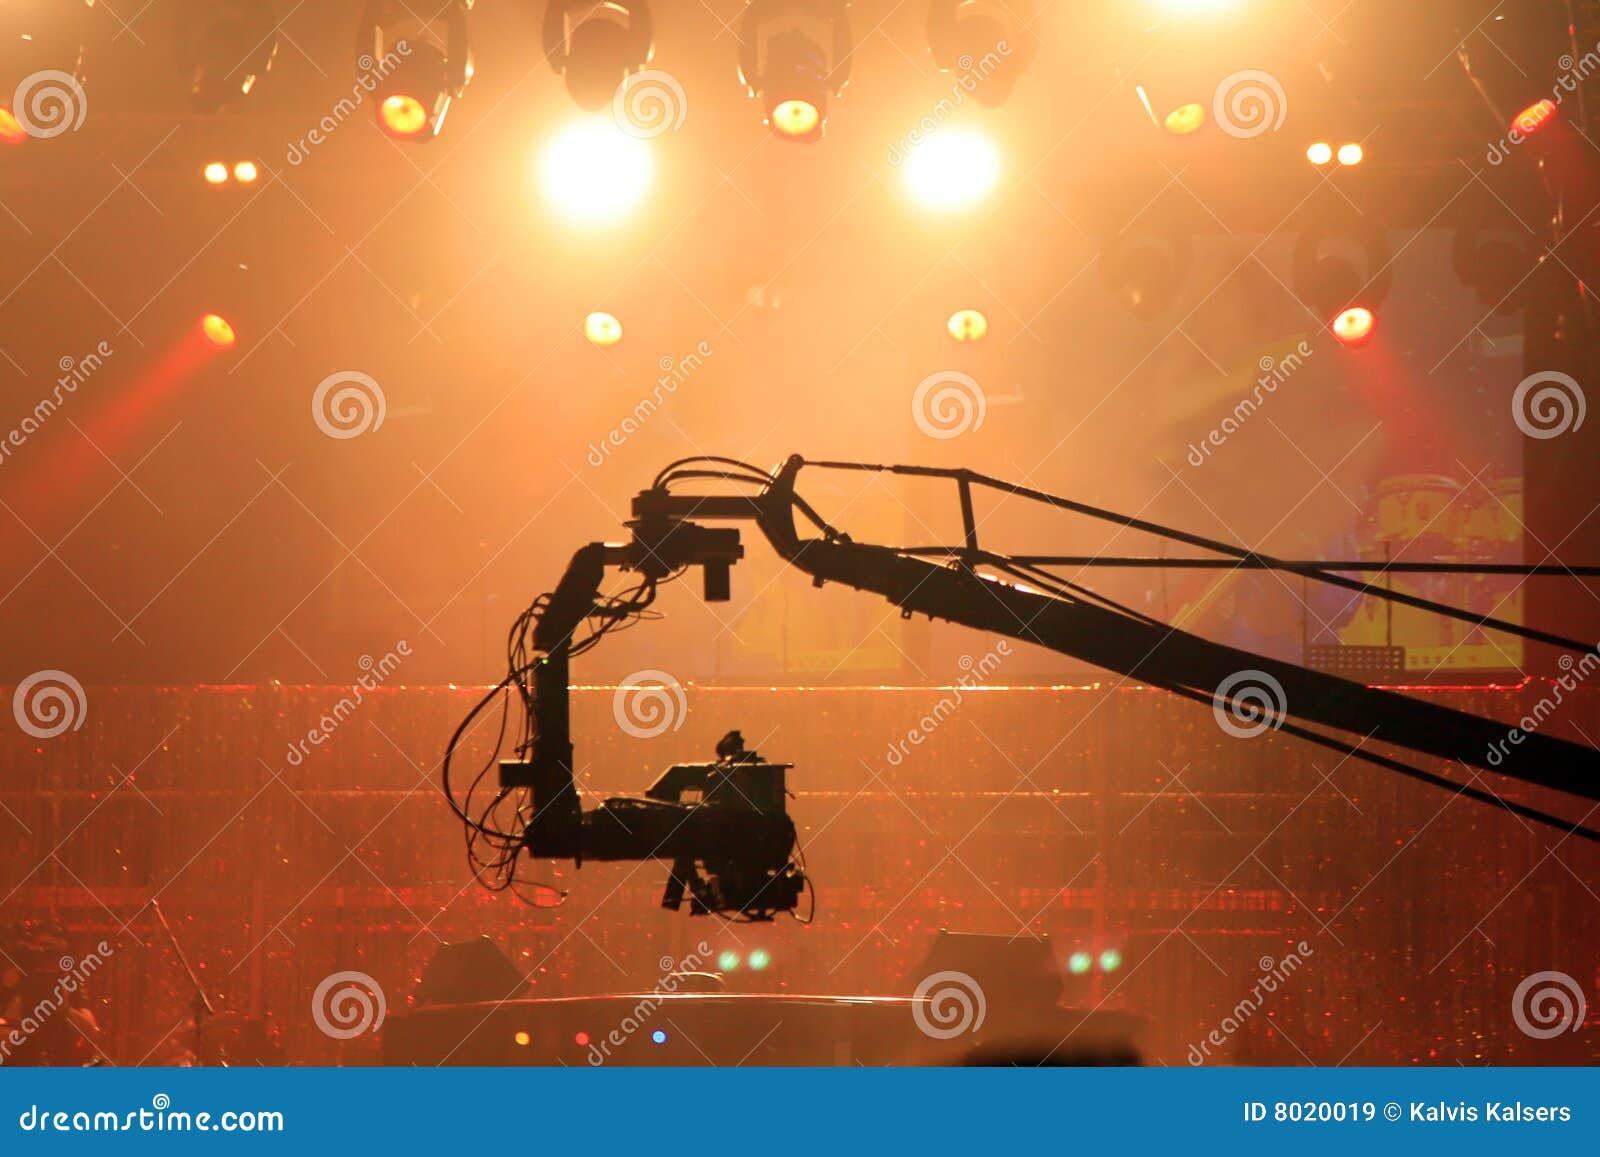 Stage video lights